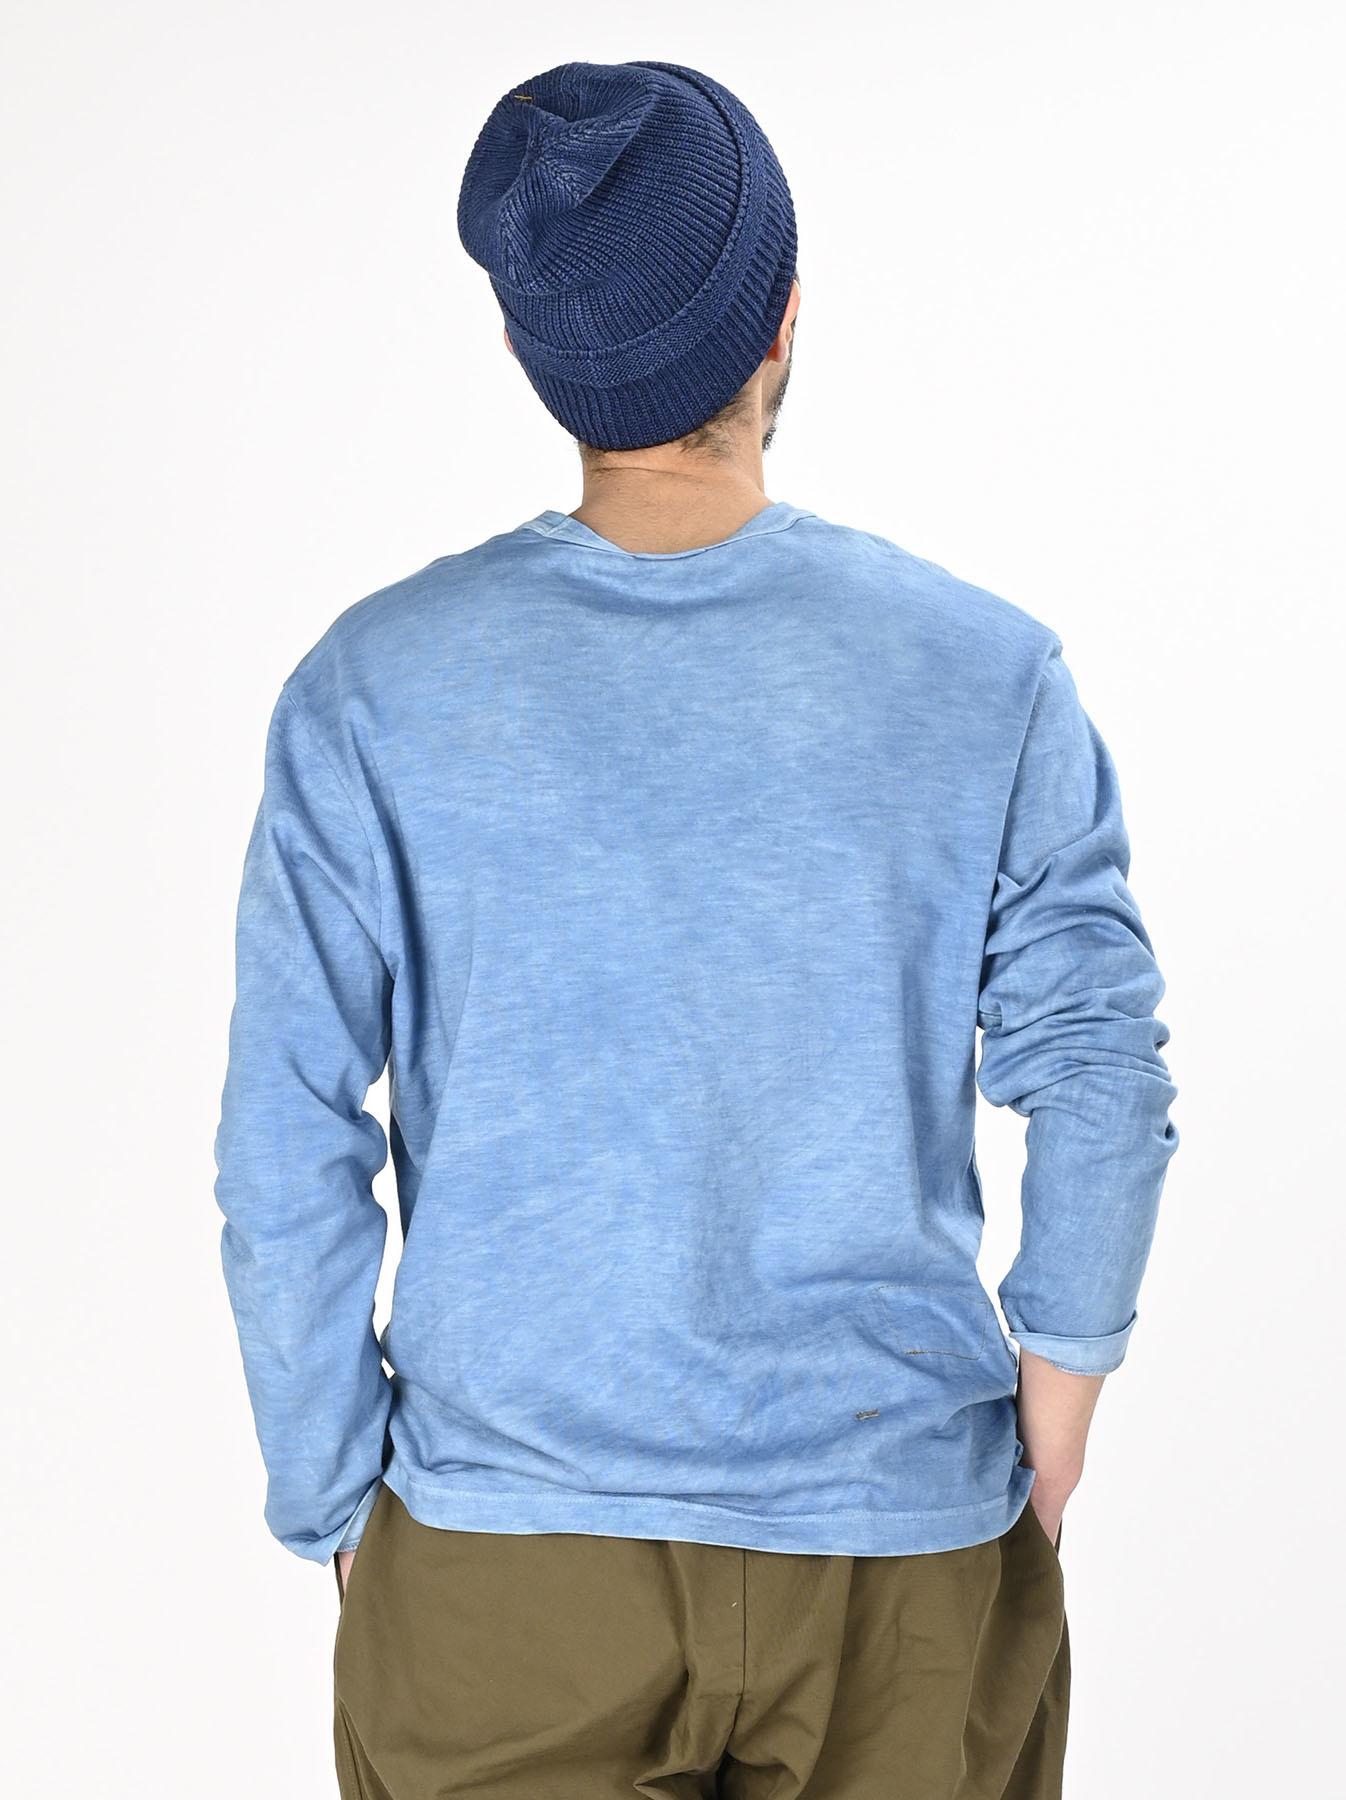 Ai Organic Supima Tenjiku Long-sleeved T-shirt-6